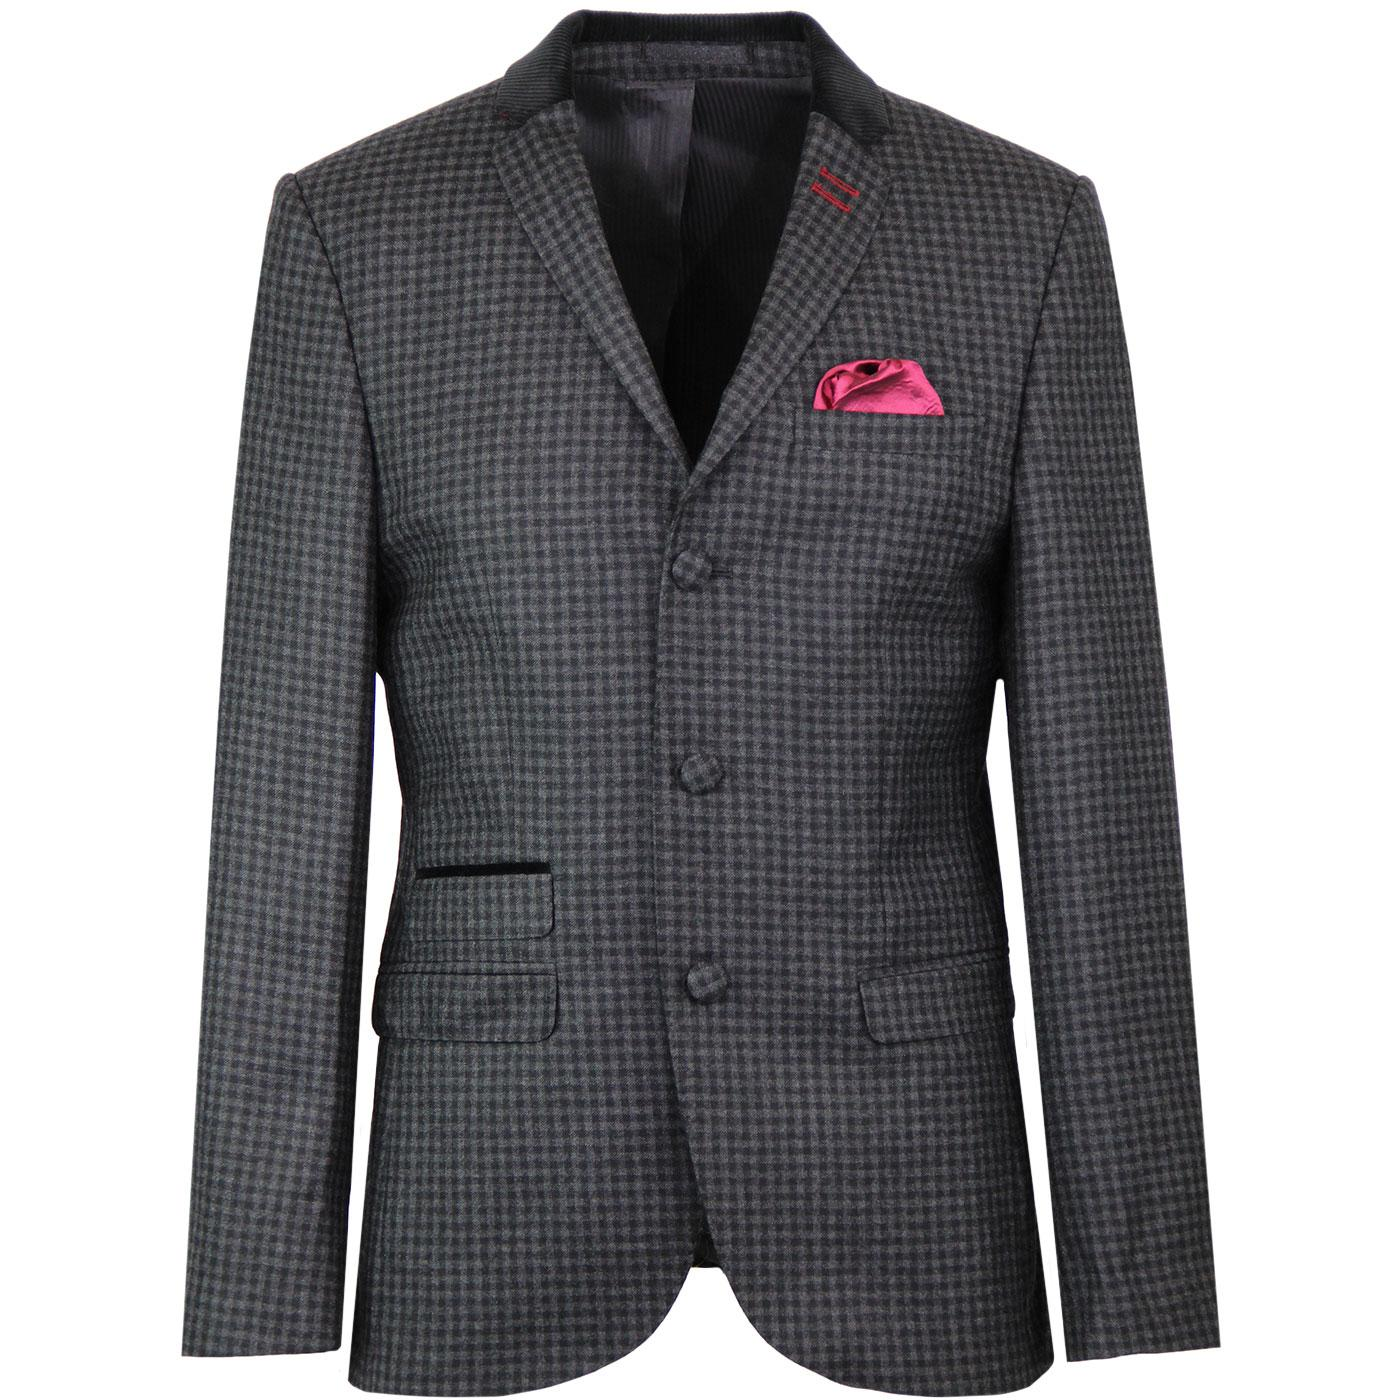 MADCAP ENGLAND Cord Collar Gingham Check Jacket